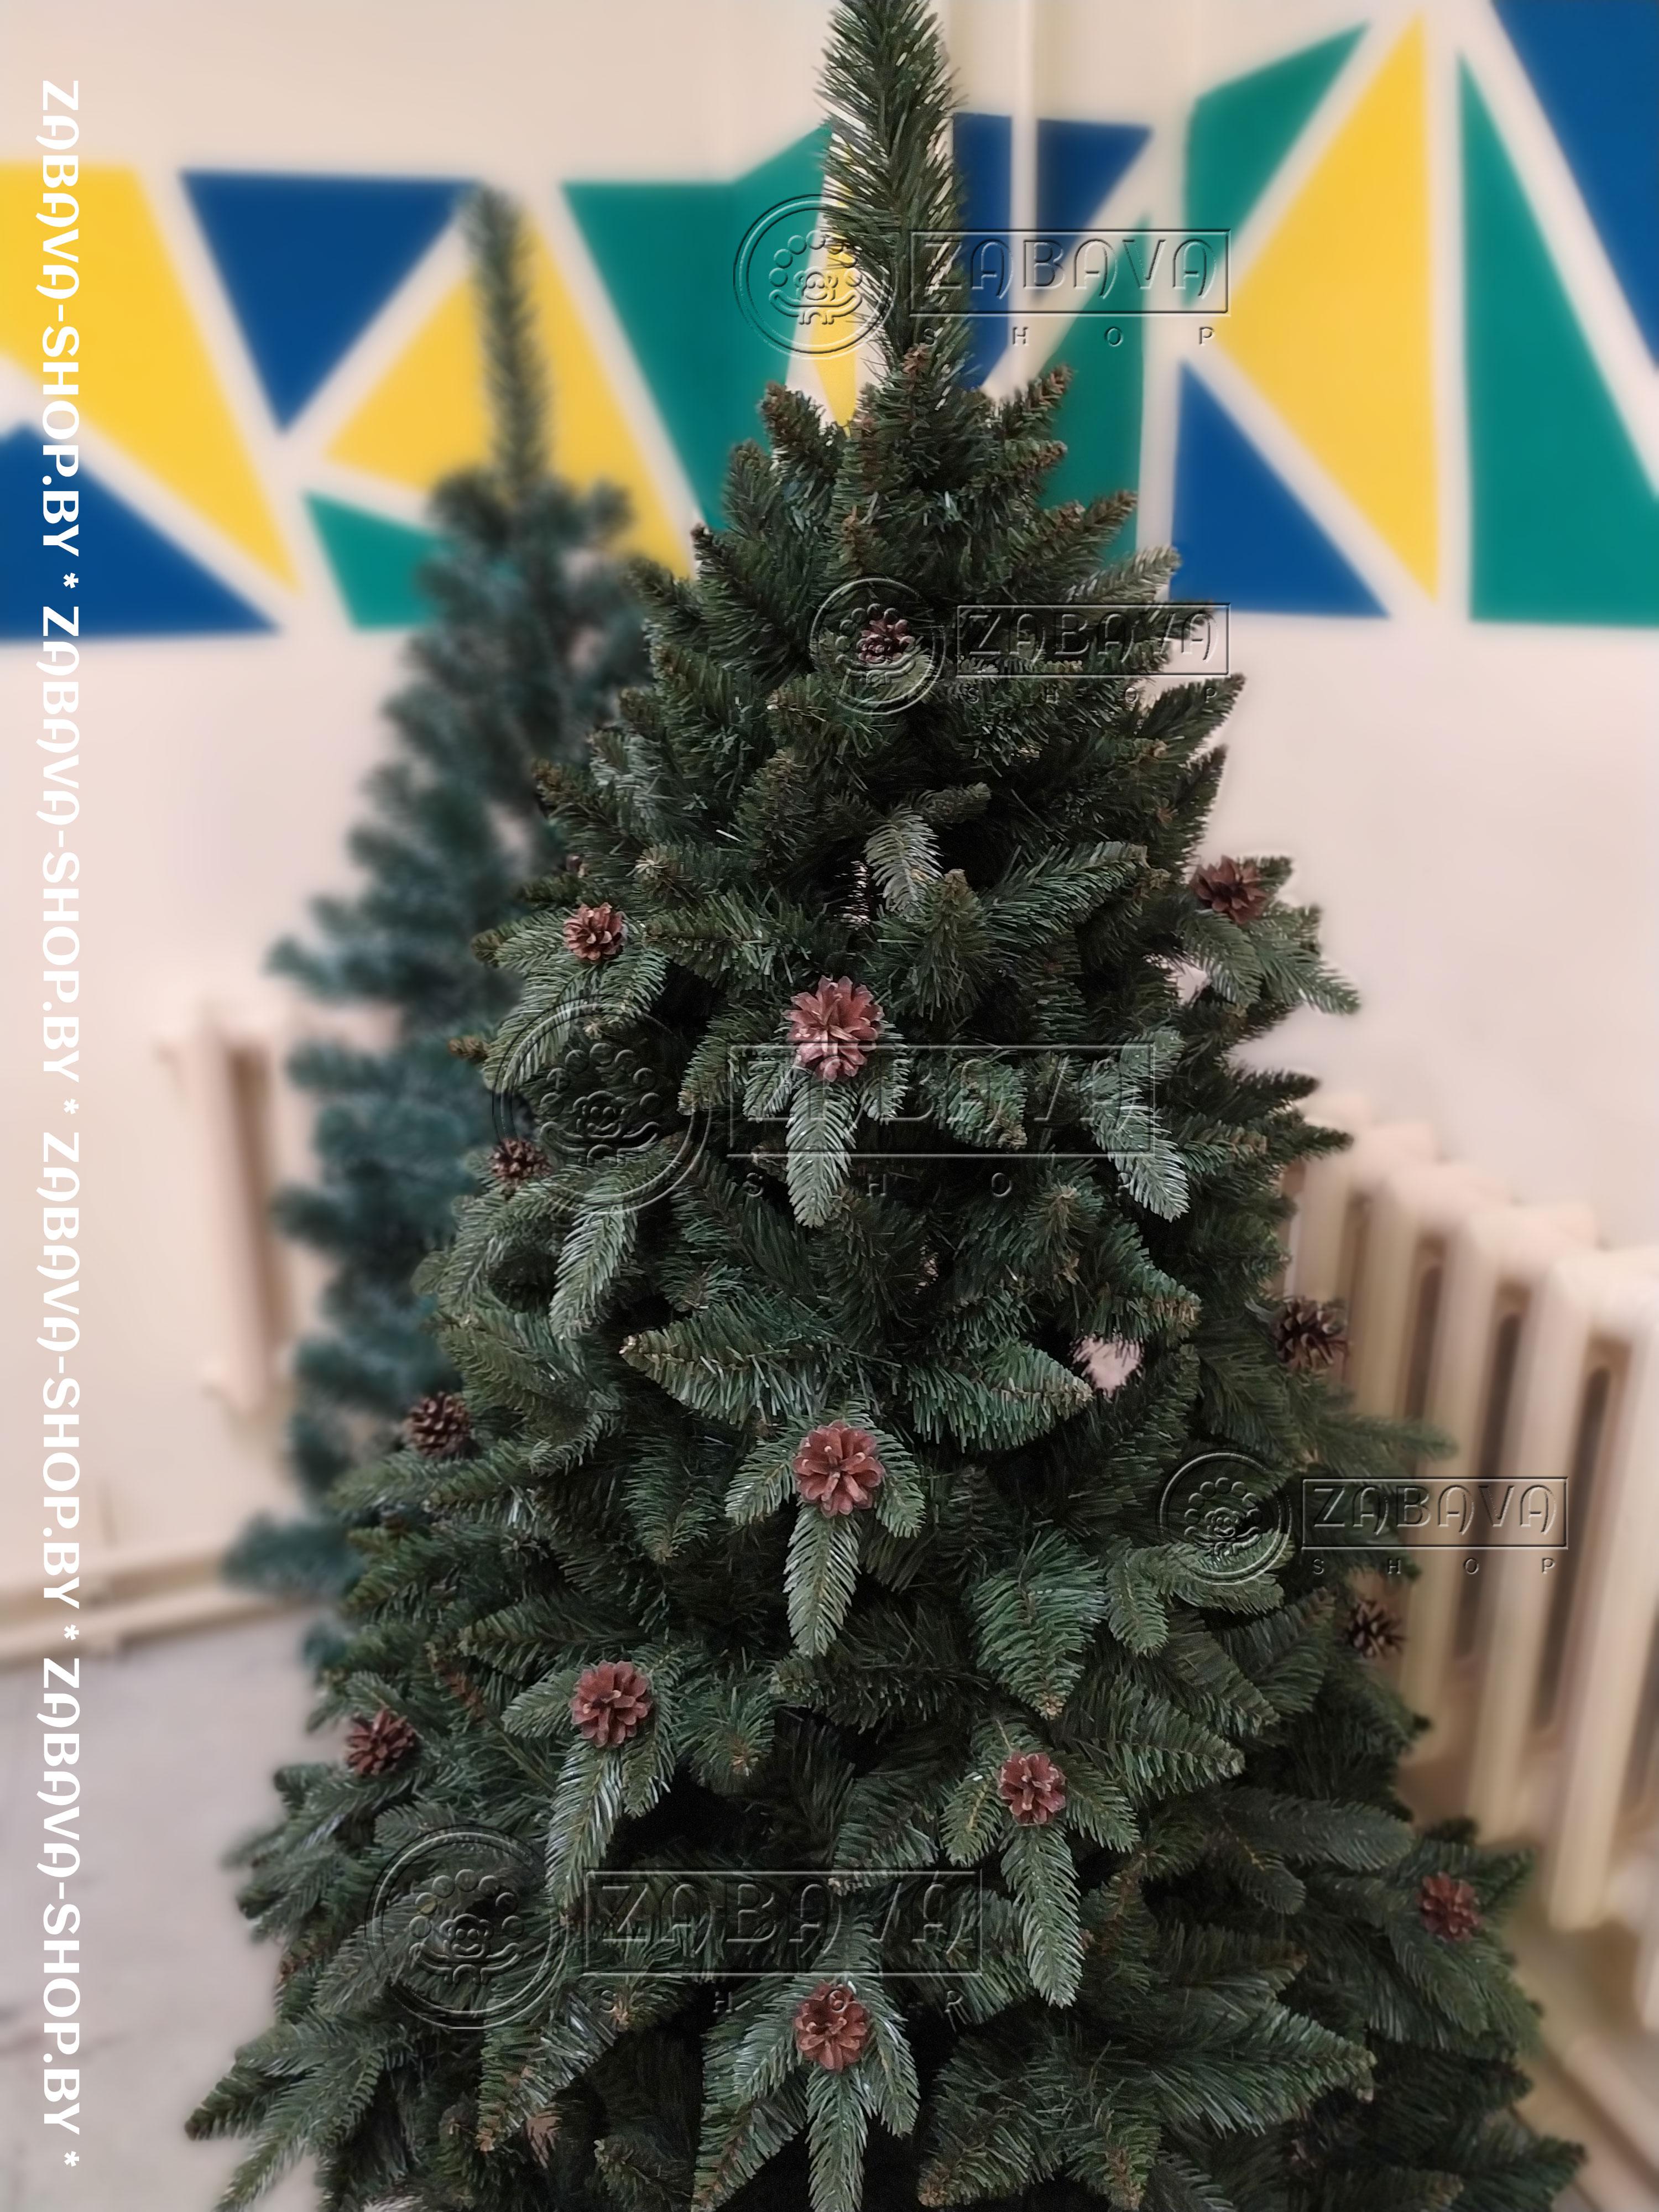 Сосна искусственная Рапсодия Натуральная 2,5 метра - zabava-shop.by